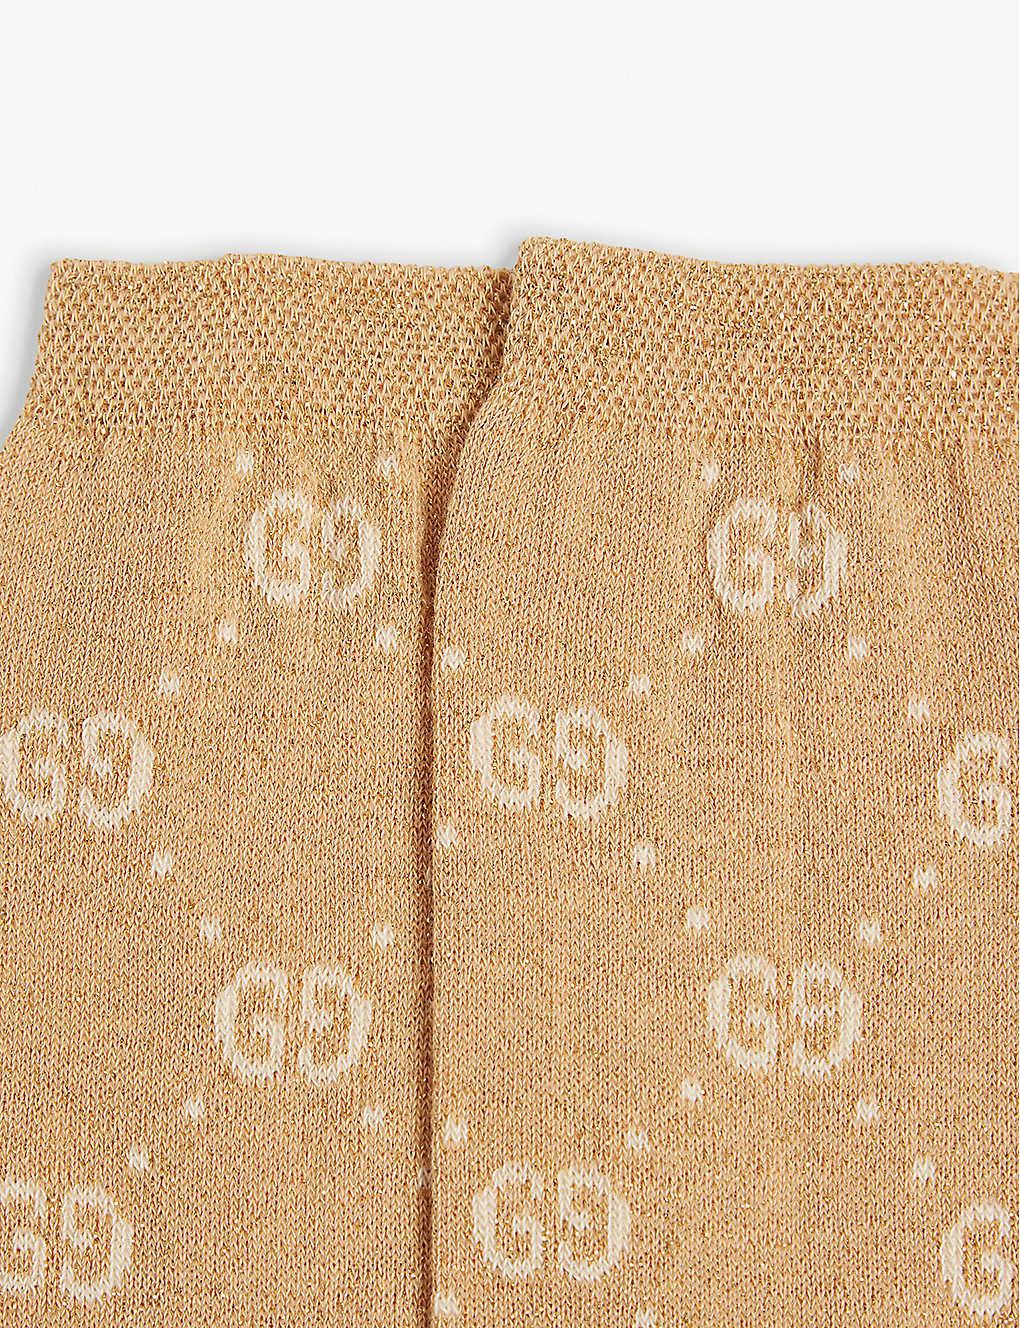 97a90e49c GUCCI - Interlocking GG cotton-blend lurex socks 6-12 years ...